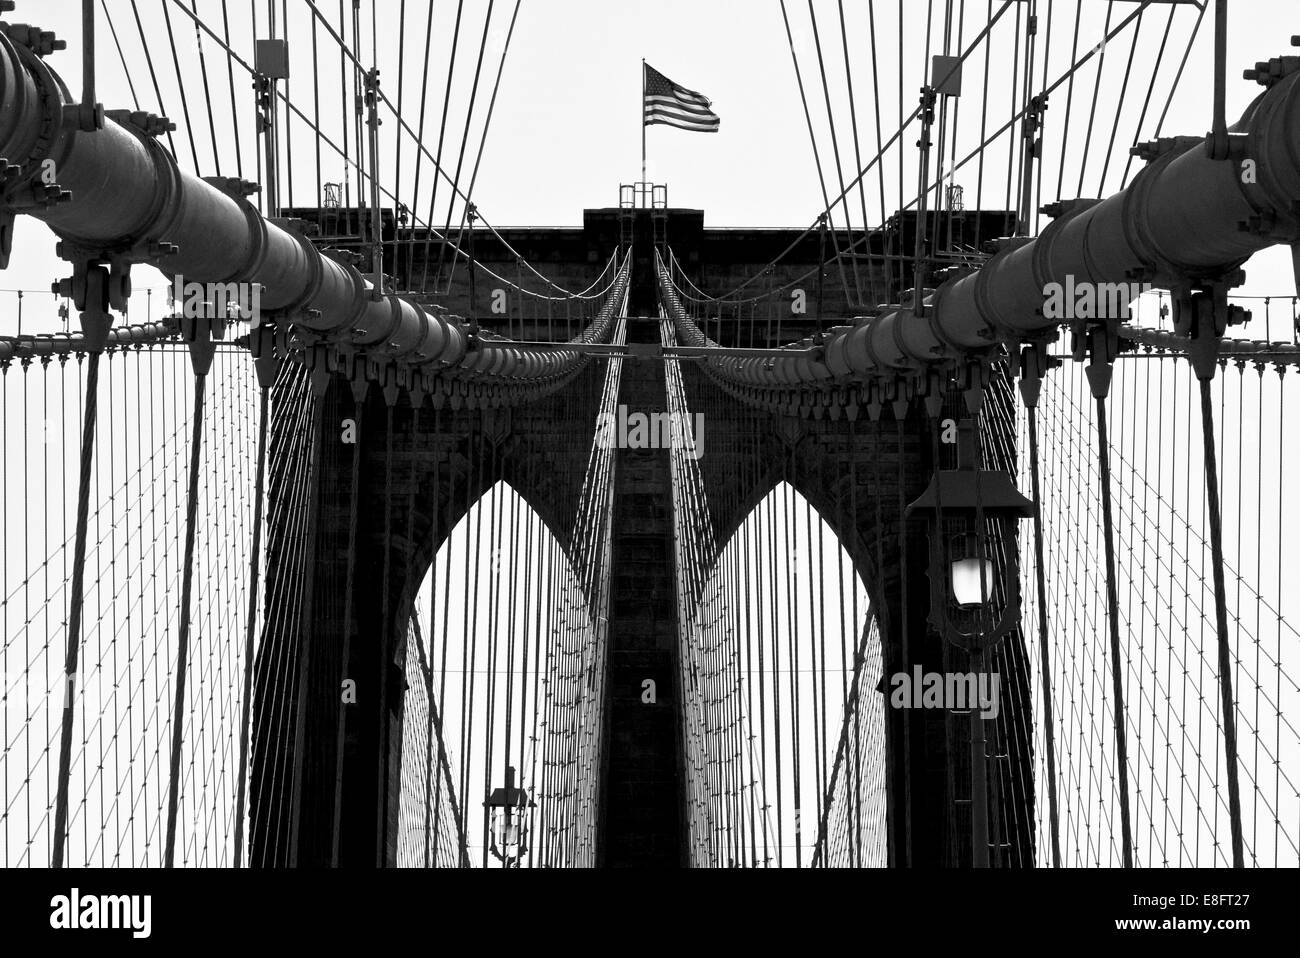 USA, New York City, Manhattan, Close up of Brooklyn Bridge with flag - Stock Image